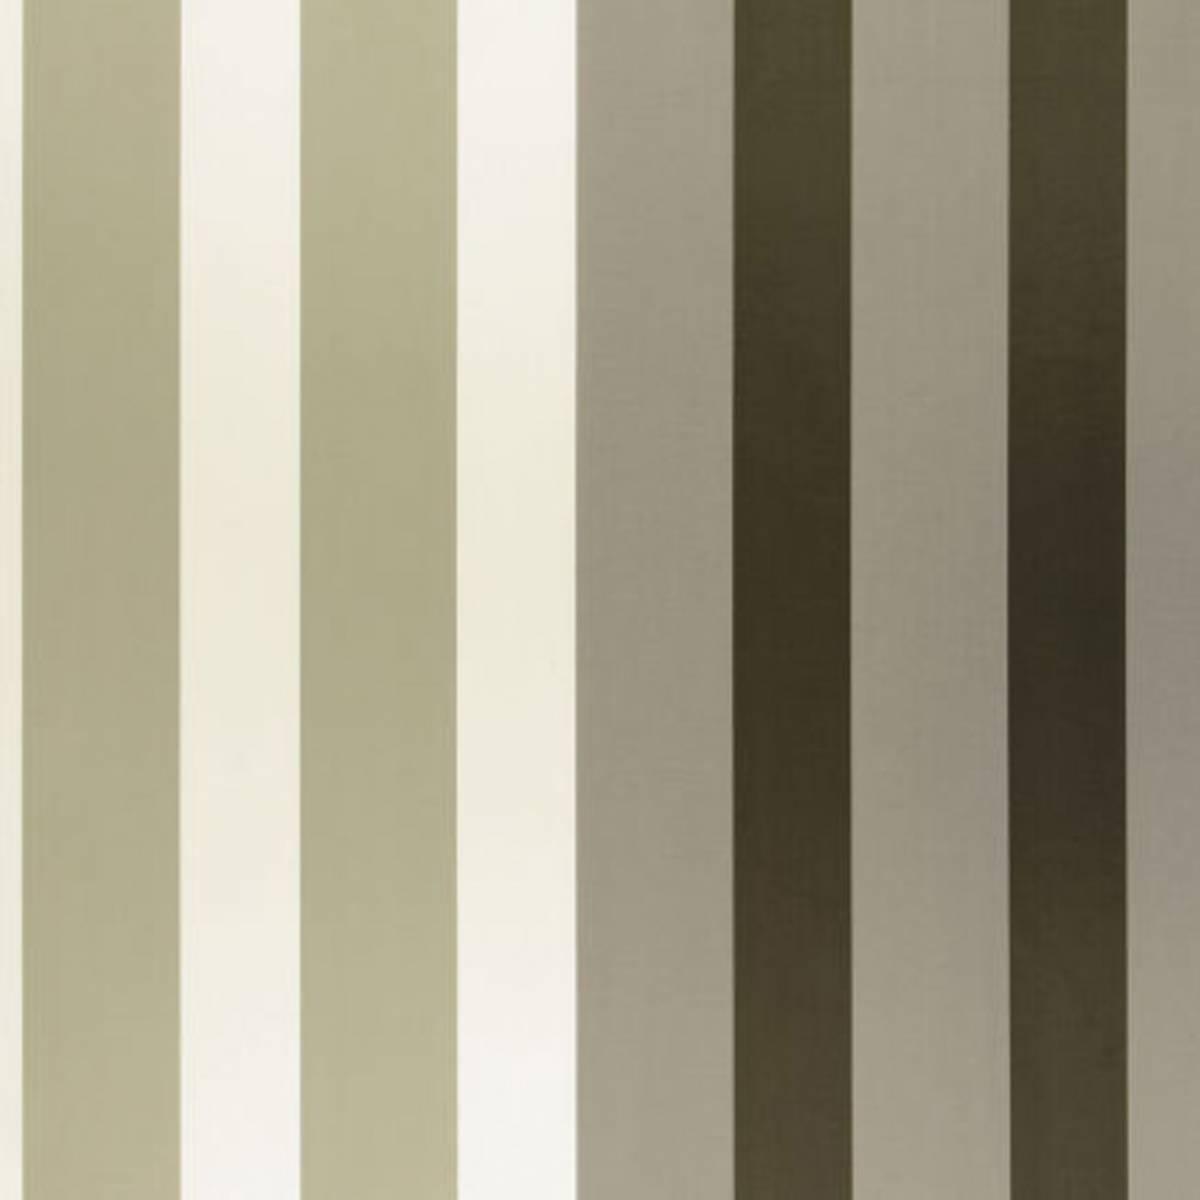 Roman Blinds In Audubon Fabric Natural F1759 01